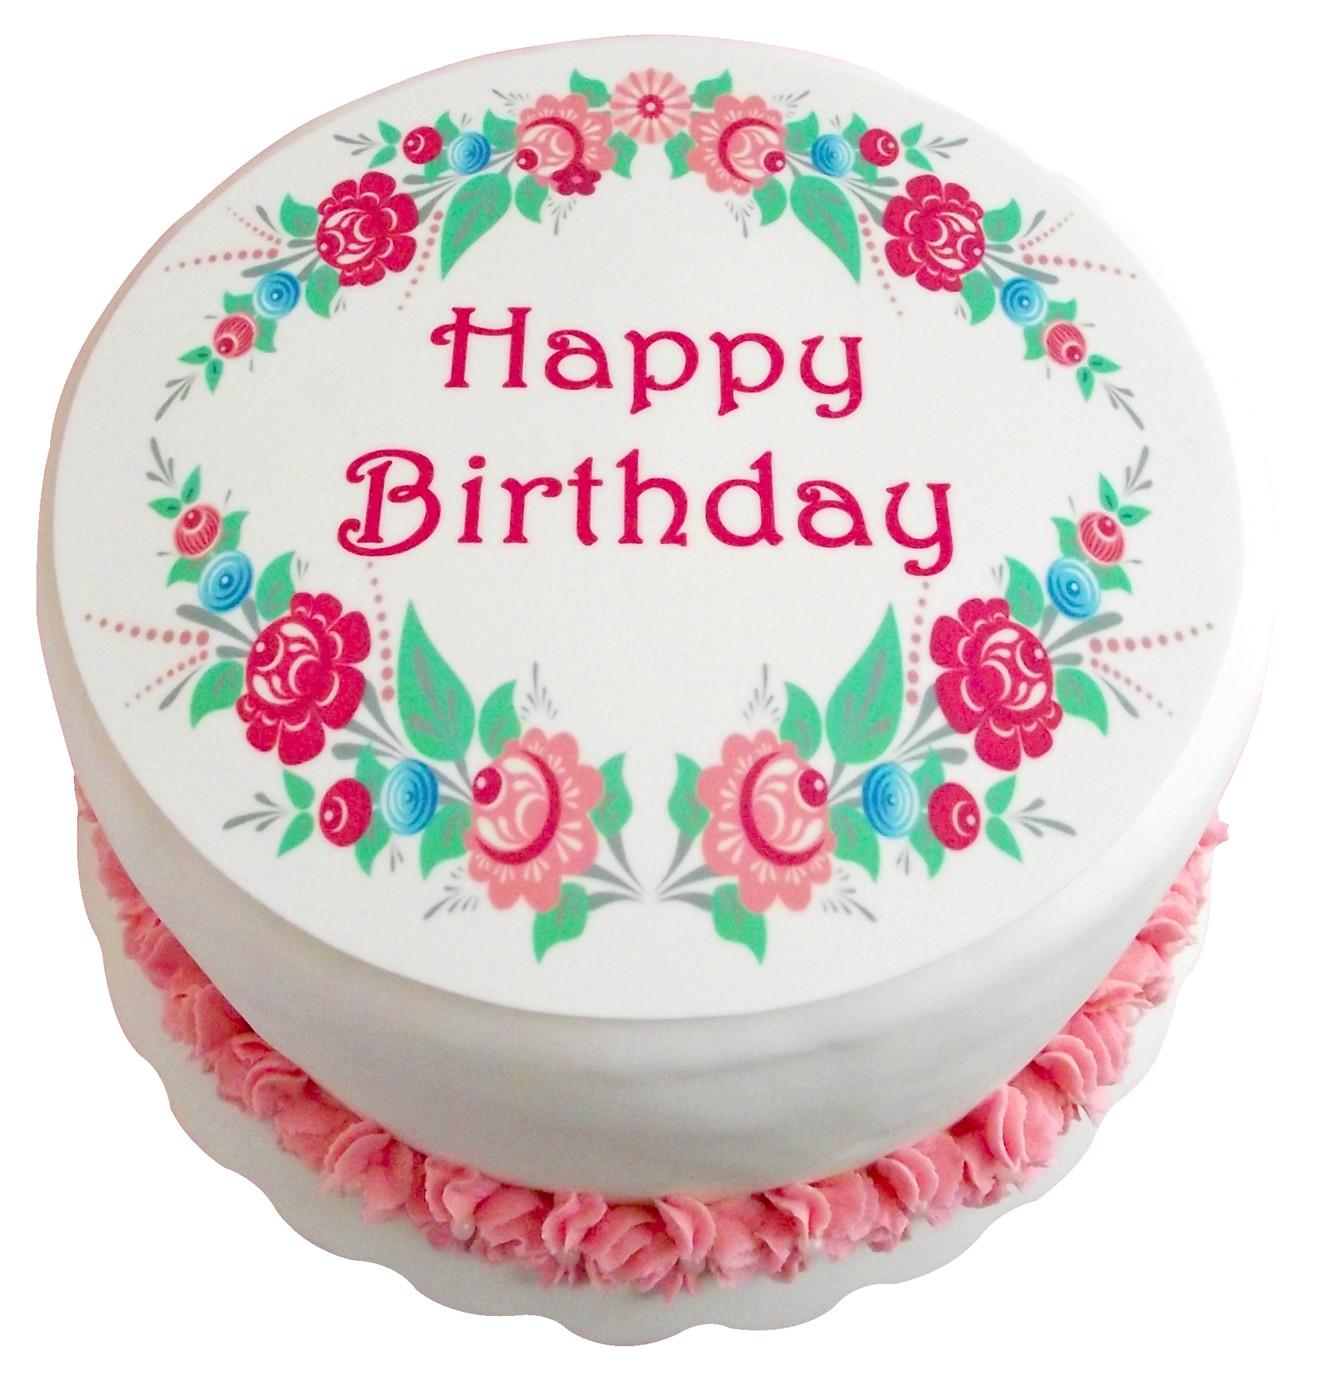 Best ideas about Birthday Cake Transparent . Save or Pin Birthday Cake PNG Transparent Image Pix Now.